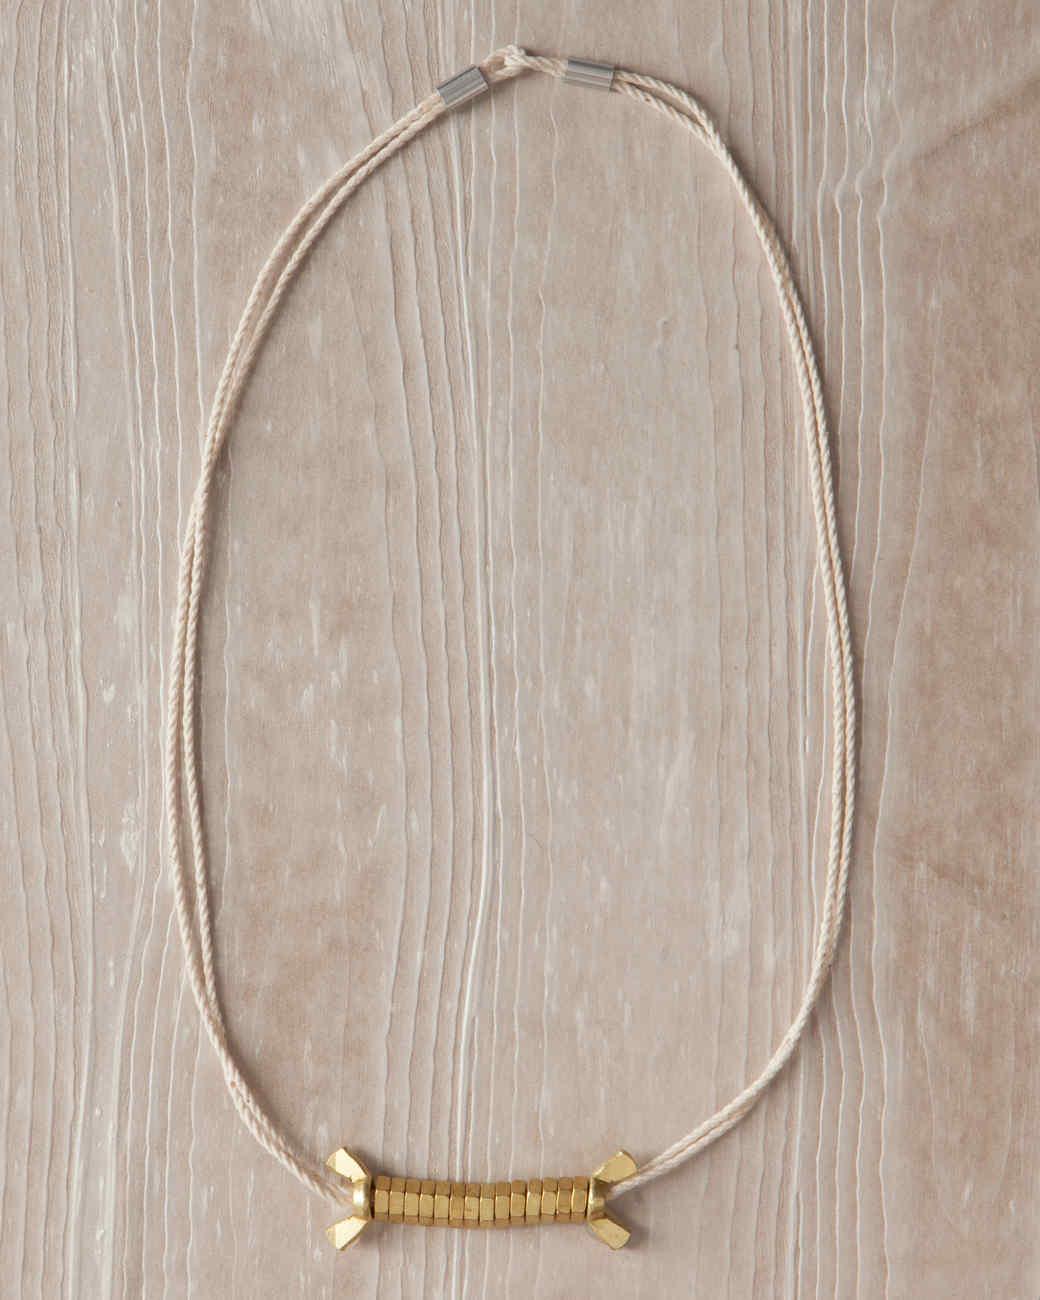 nut-necklace-hardware-jewelry-040-ld110089.jpg